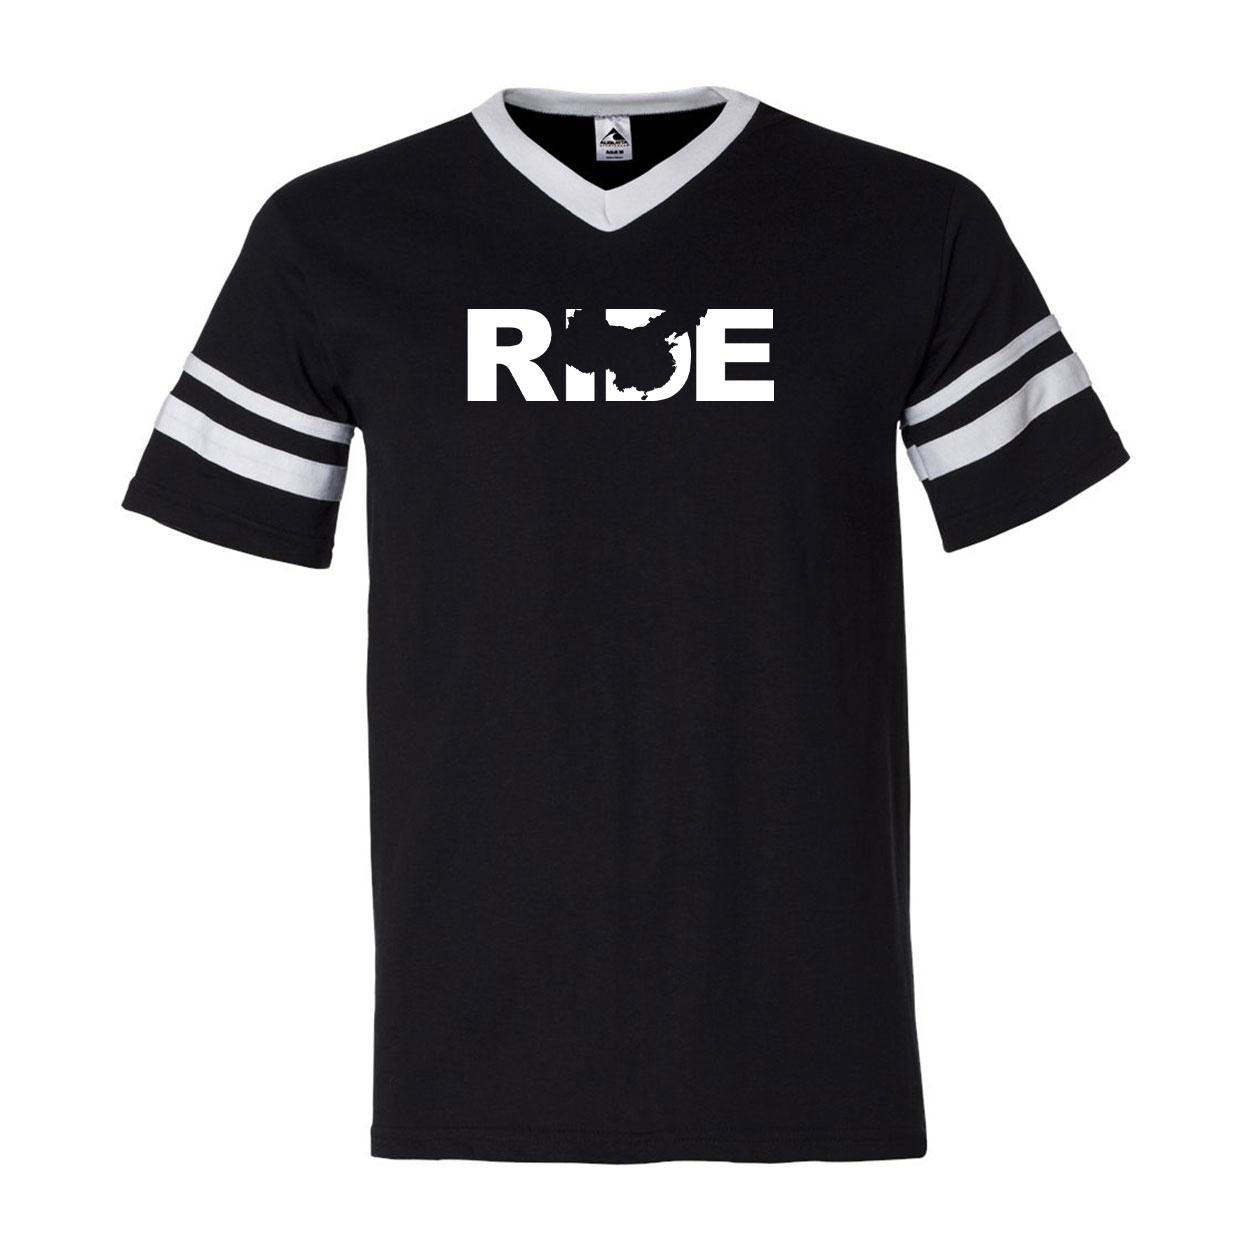 Ride China Classic Premium Striped Jersey T-Shirt Black/White (White Logo)